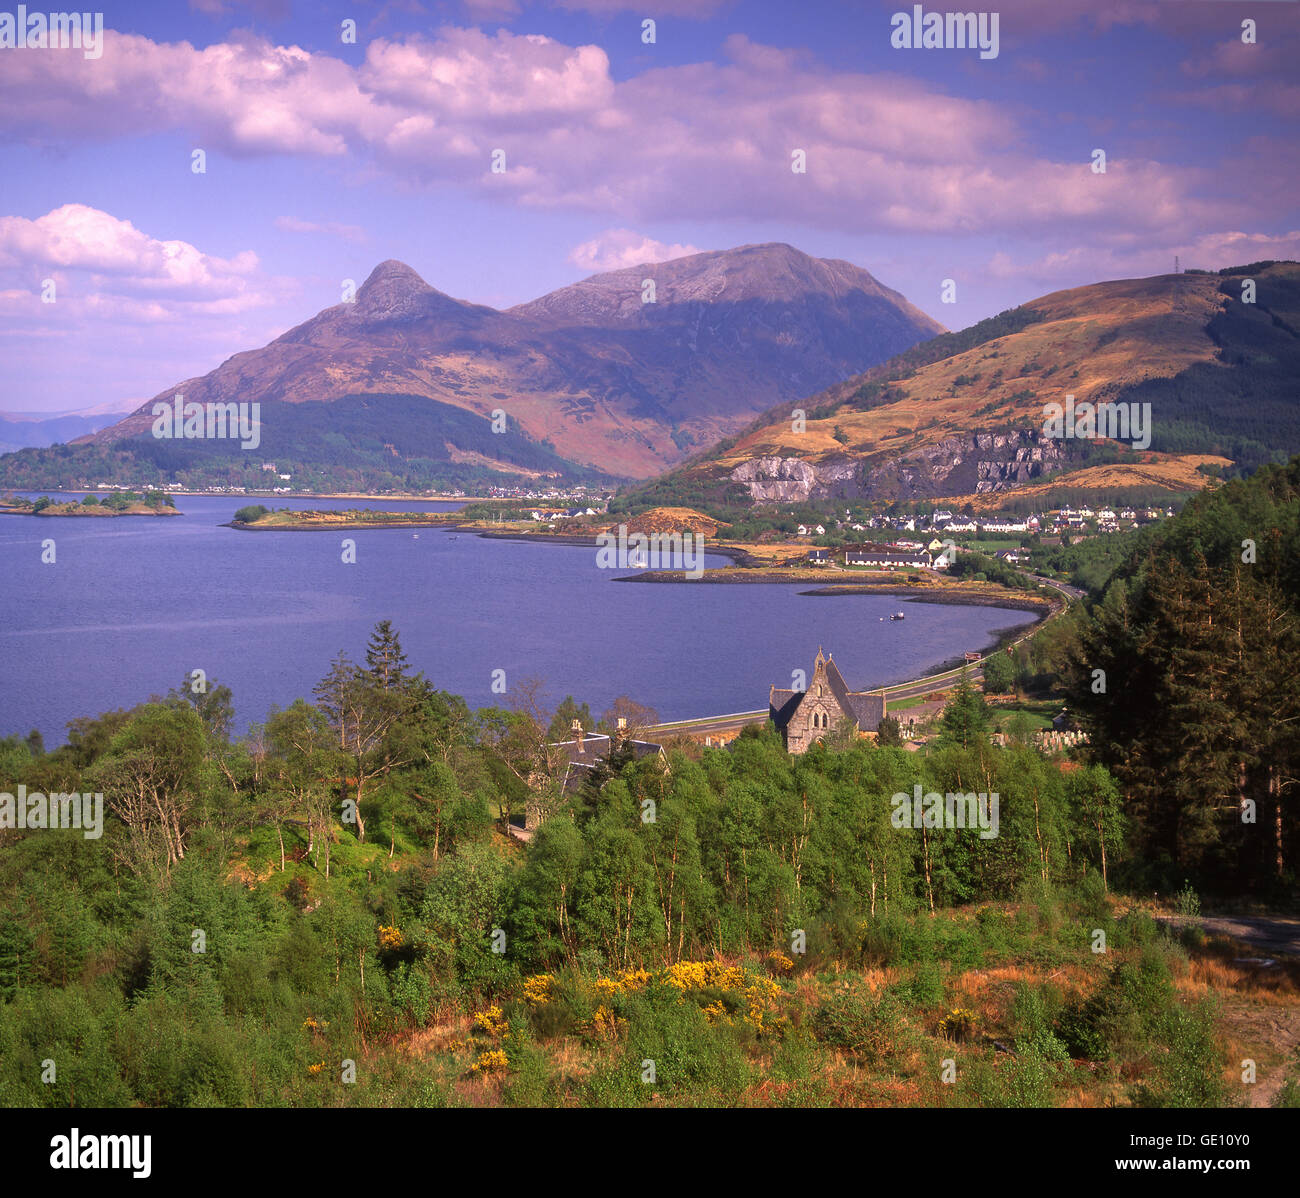 The Pap of Glencoe, West Highlands - Stock Image